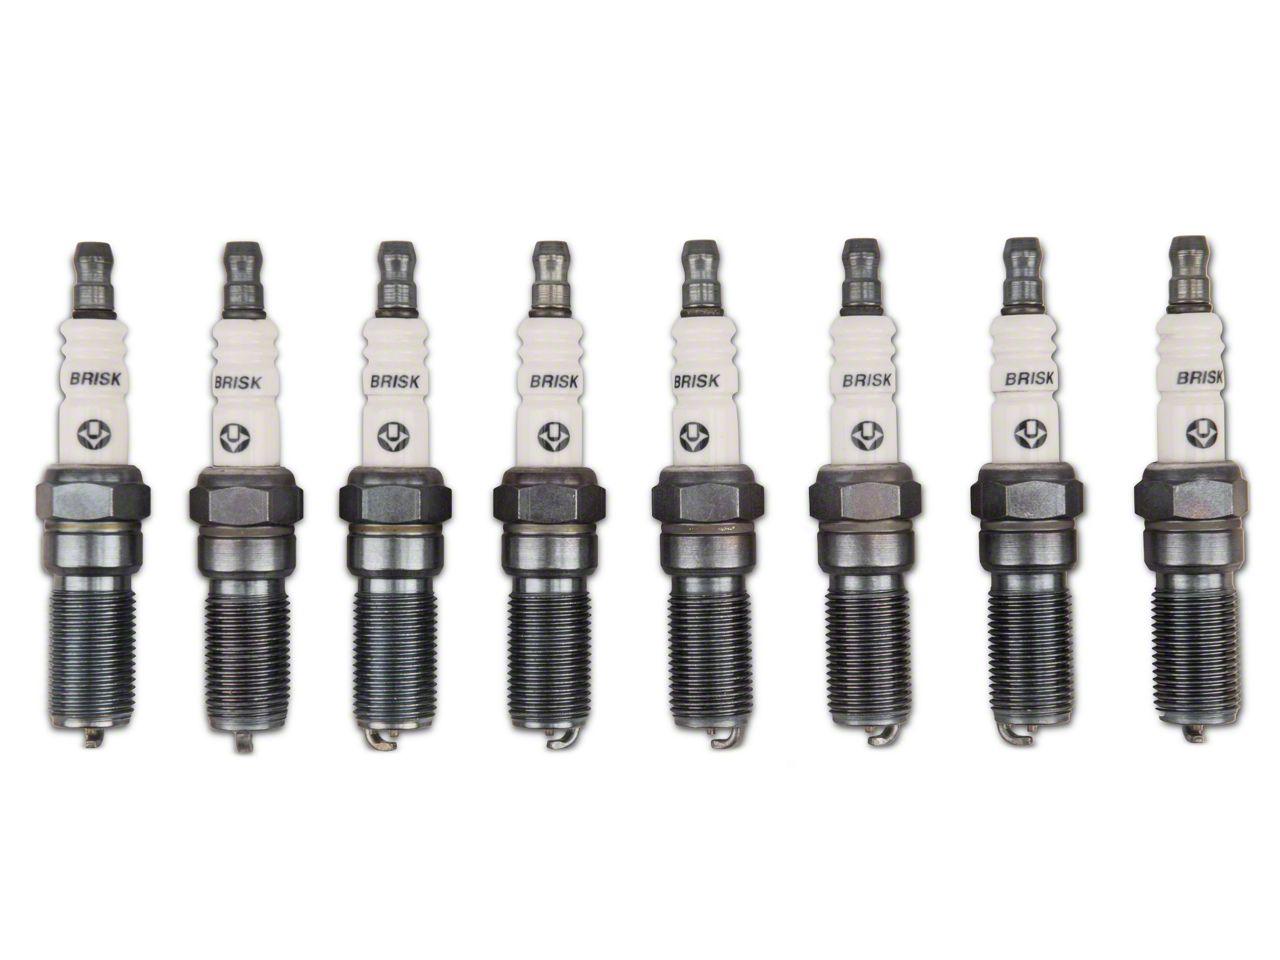 Brisk Silver Racing Spark Plugs - Mild Boost (11-17 GT; 12-13 BOSS 302)